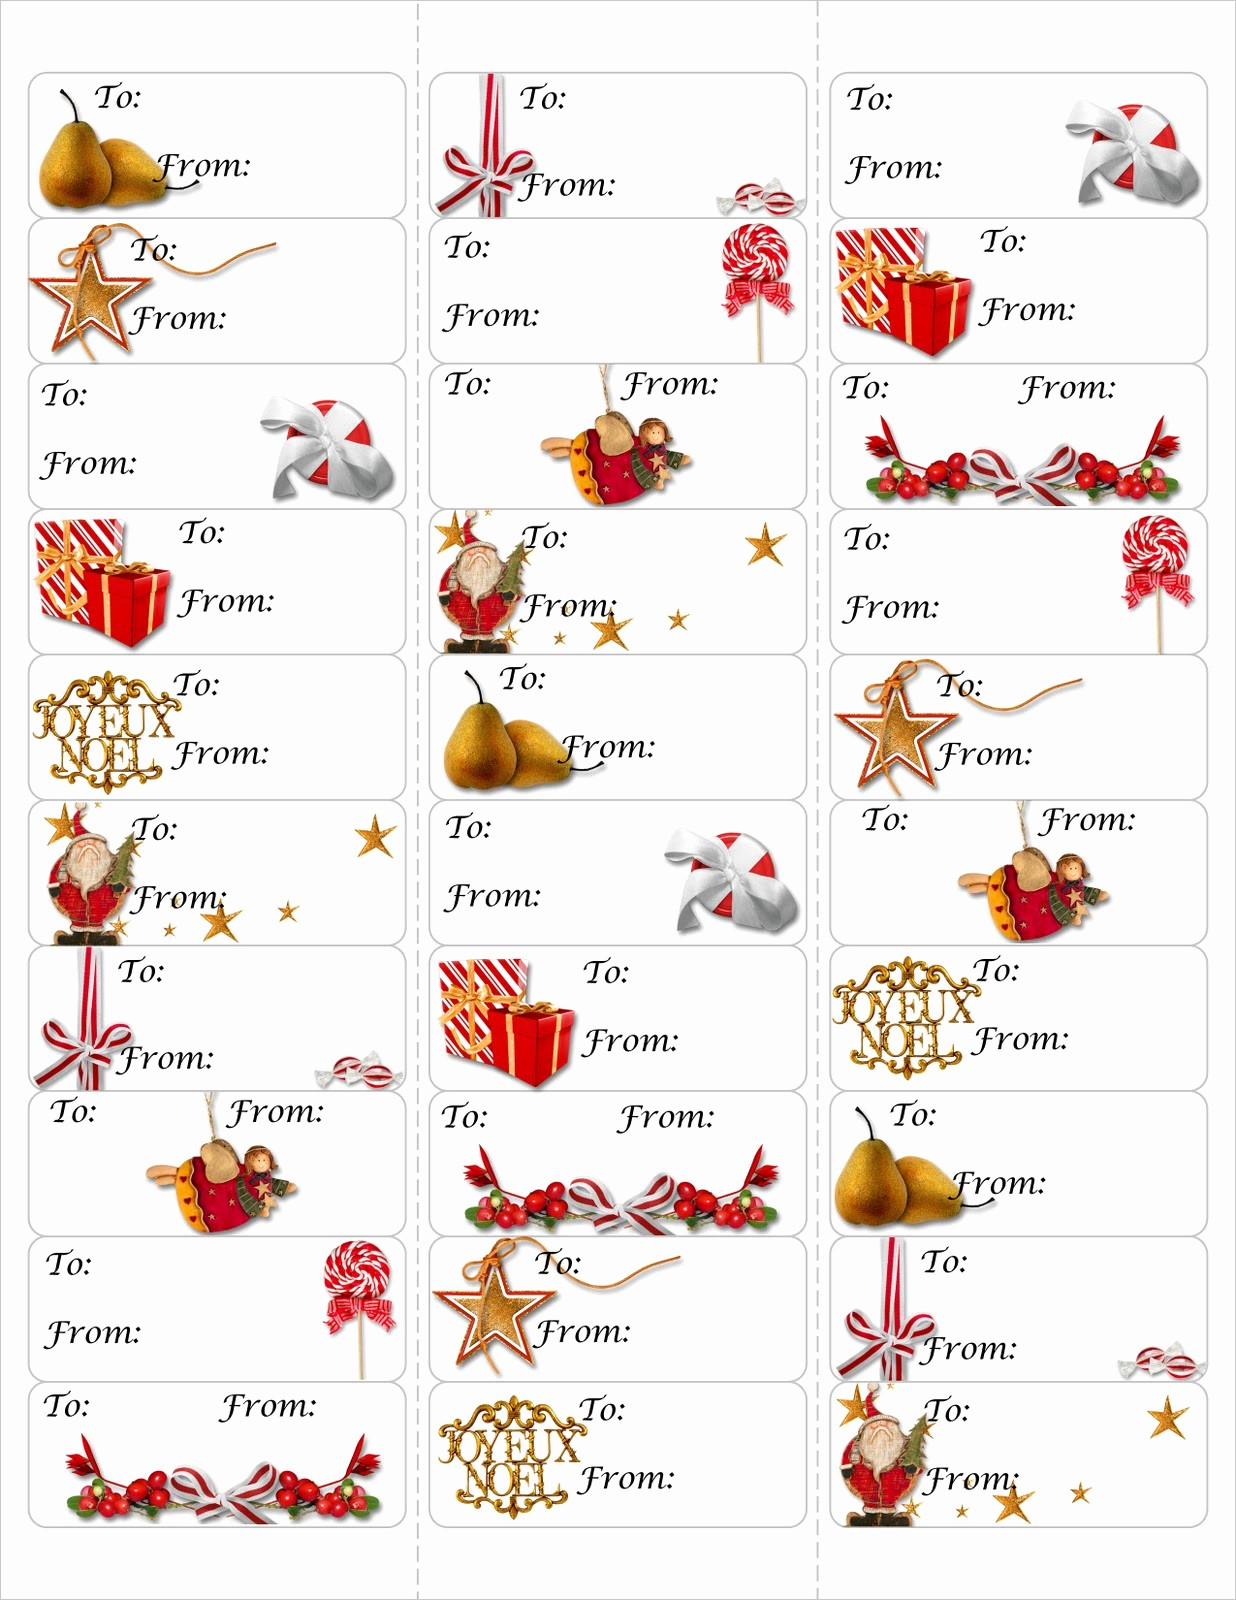 Avery 8160 Christmas Gift Labels Elegant True Taggin Love Free Christmas Gift Tag Printable